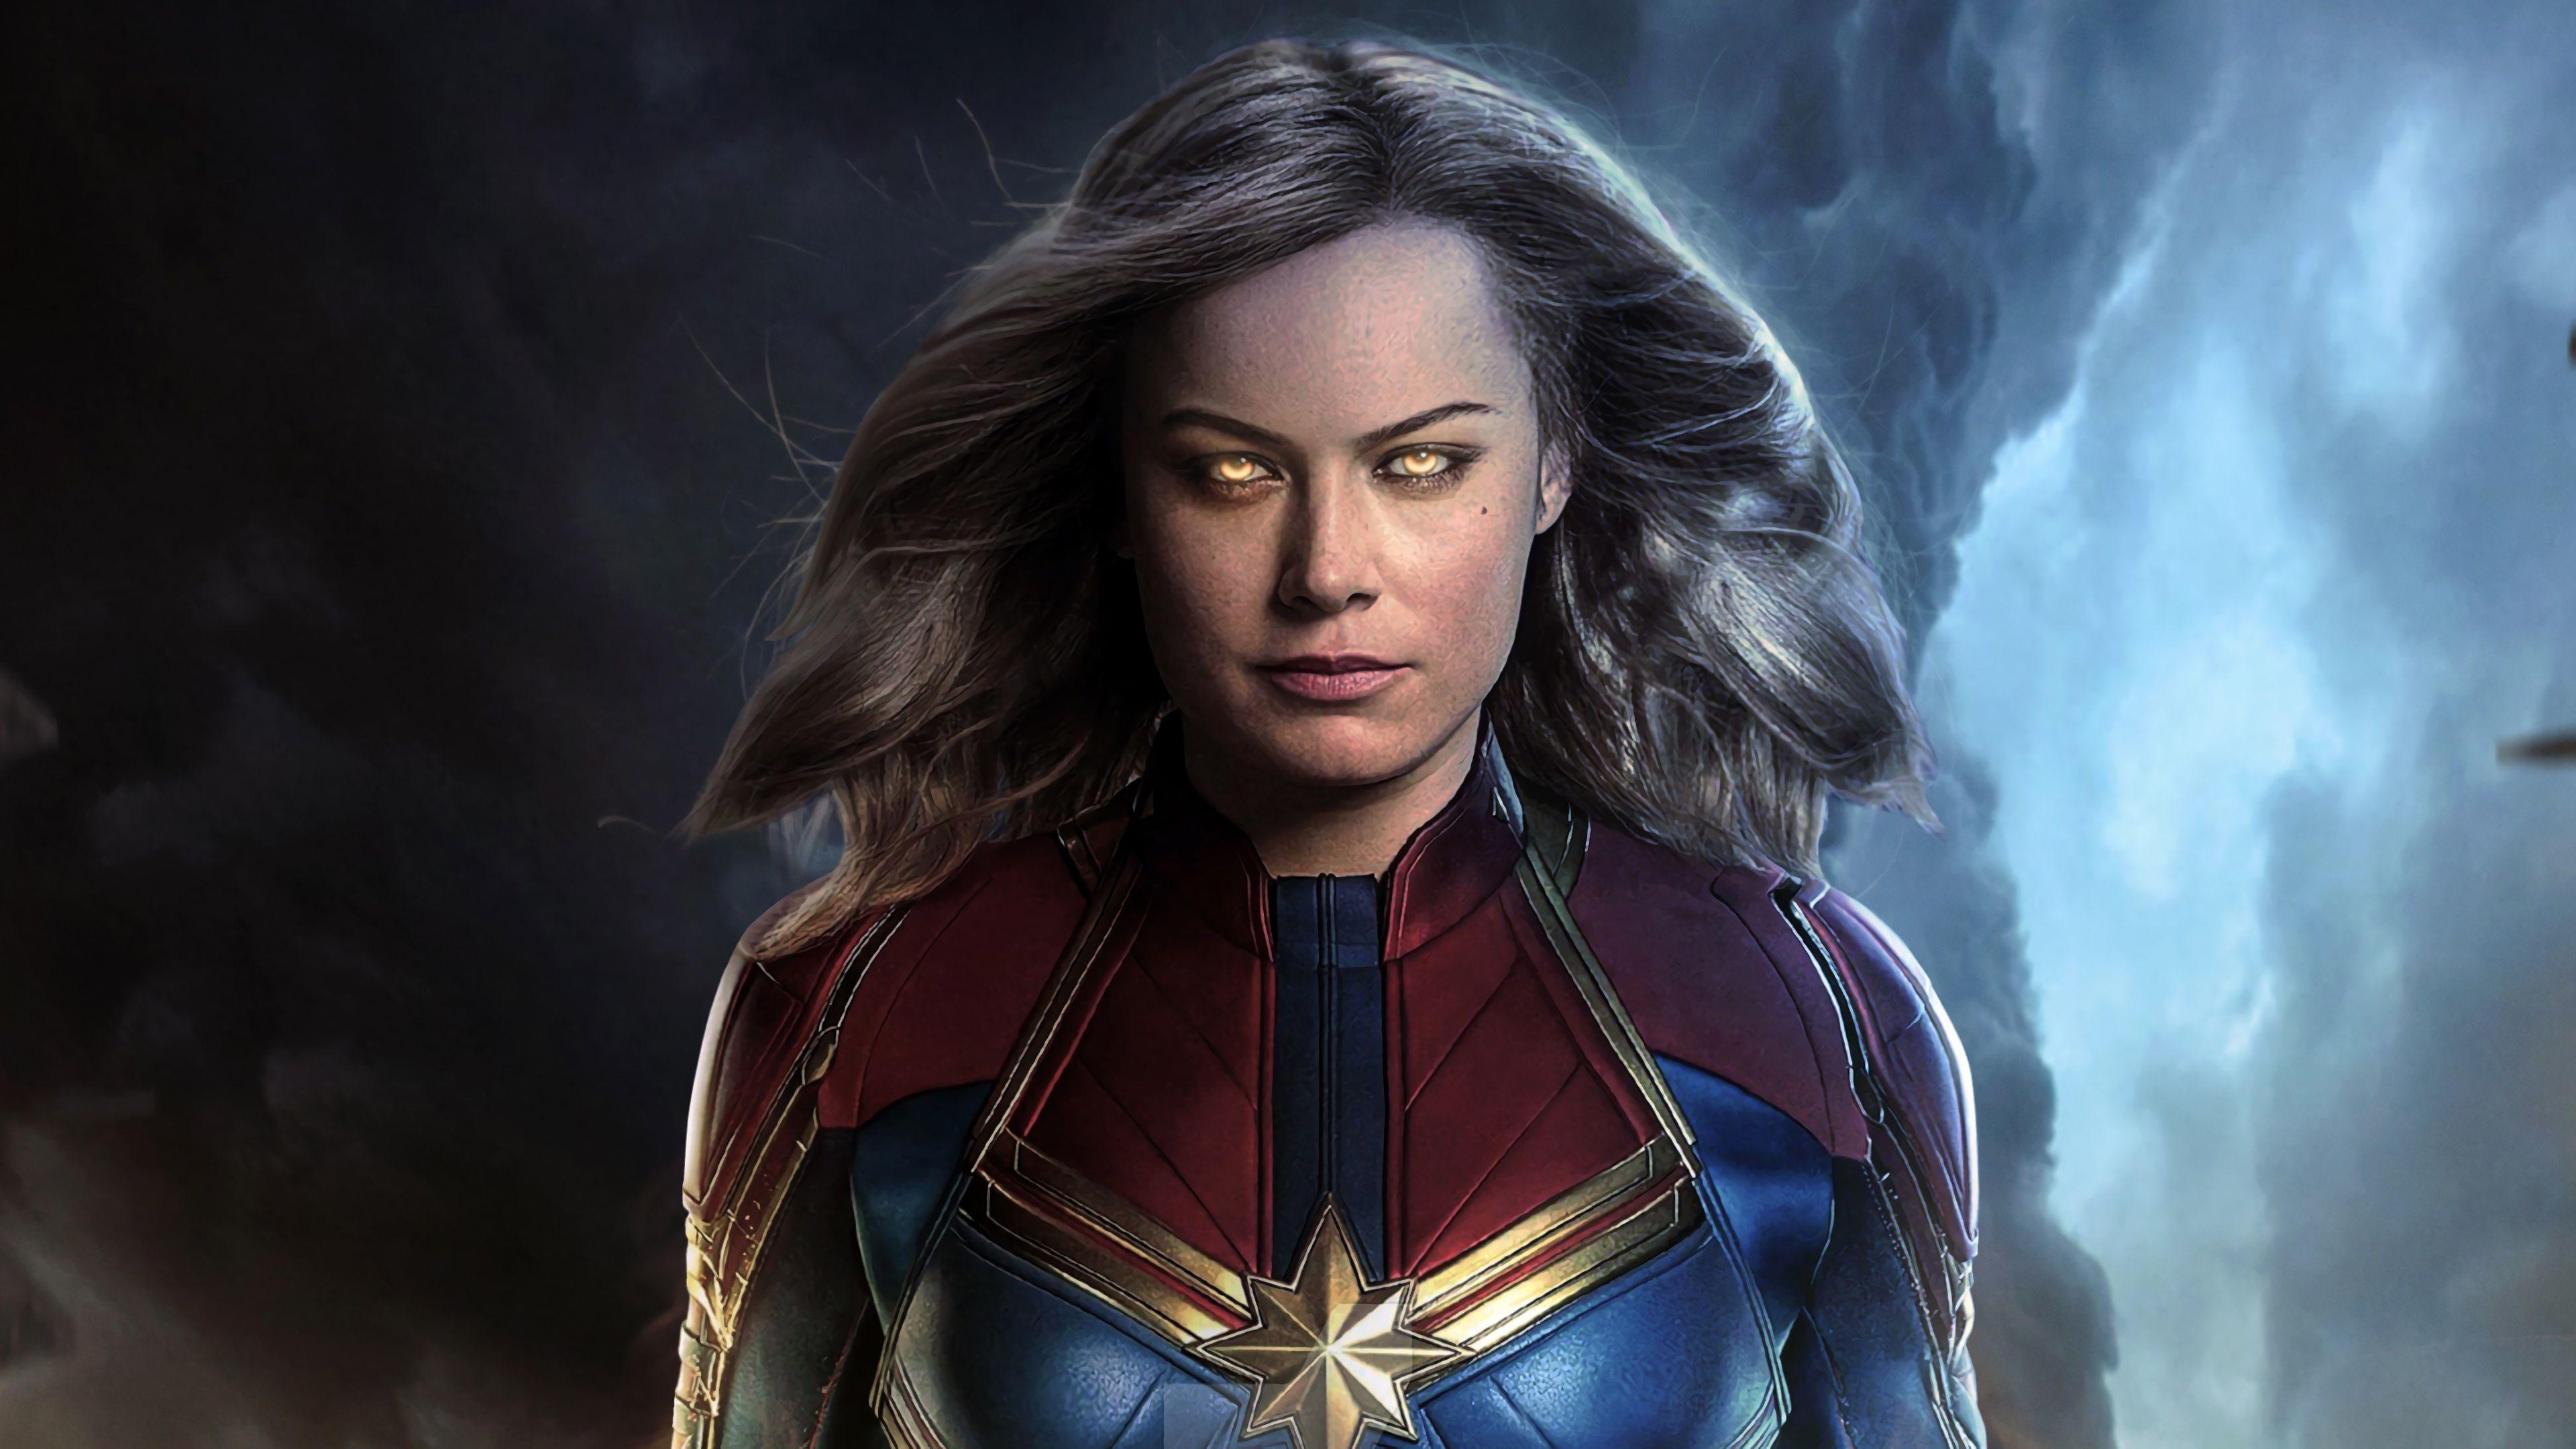 Captain Marvel Movie 2019 Brie Larson As Carol Danvers 4k Wallpaper